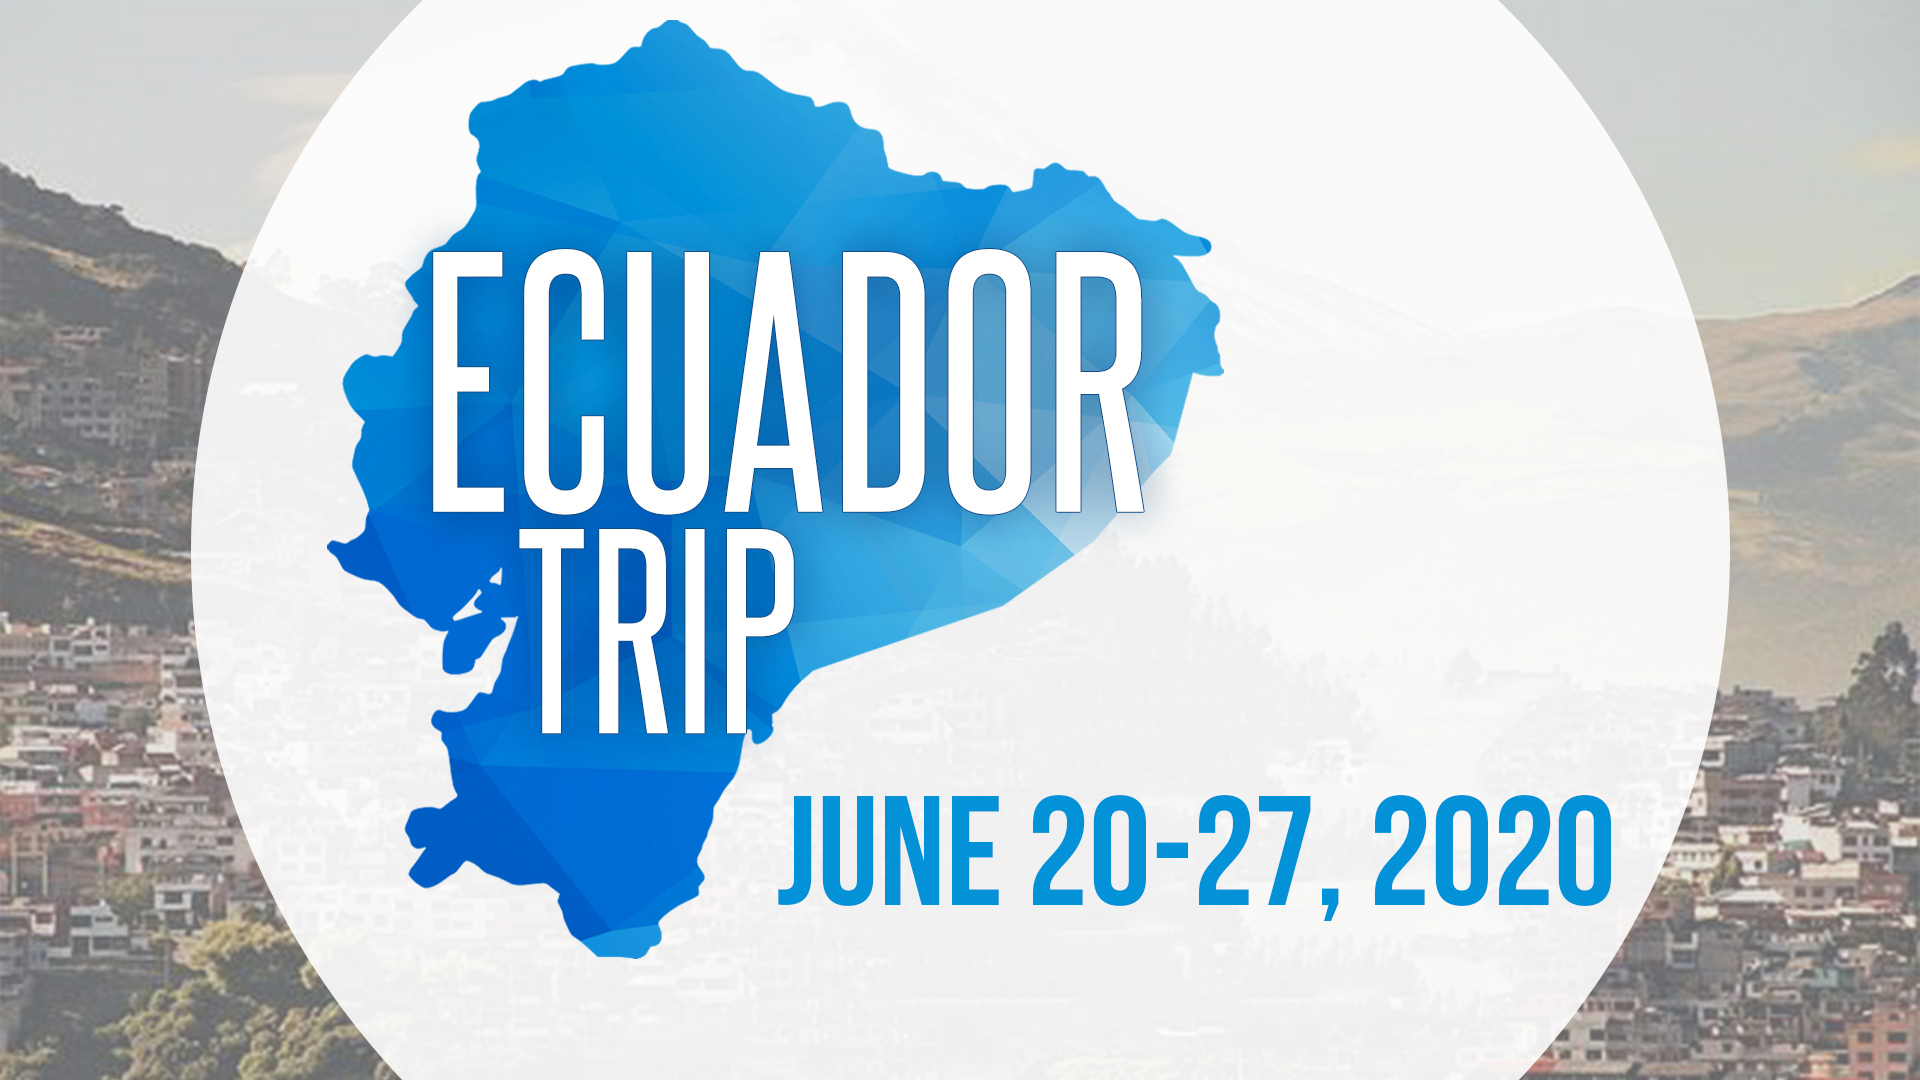 Ecuador Trip (web).jpg